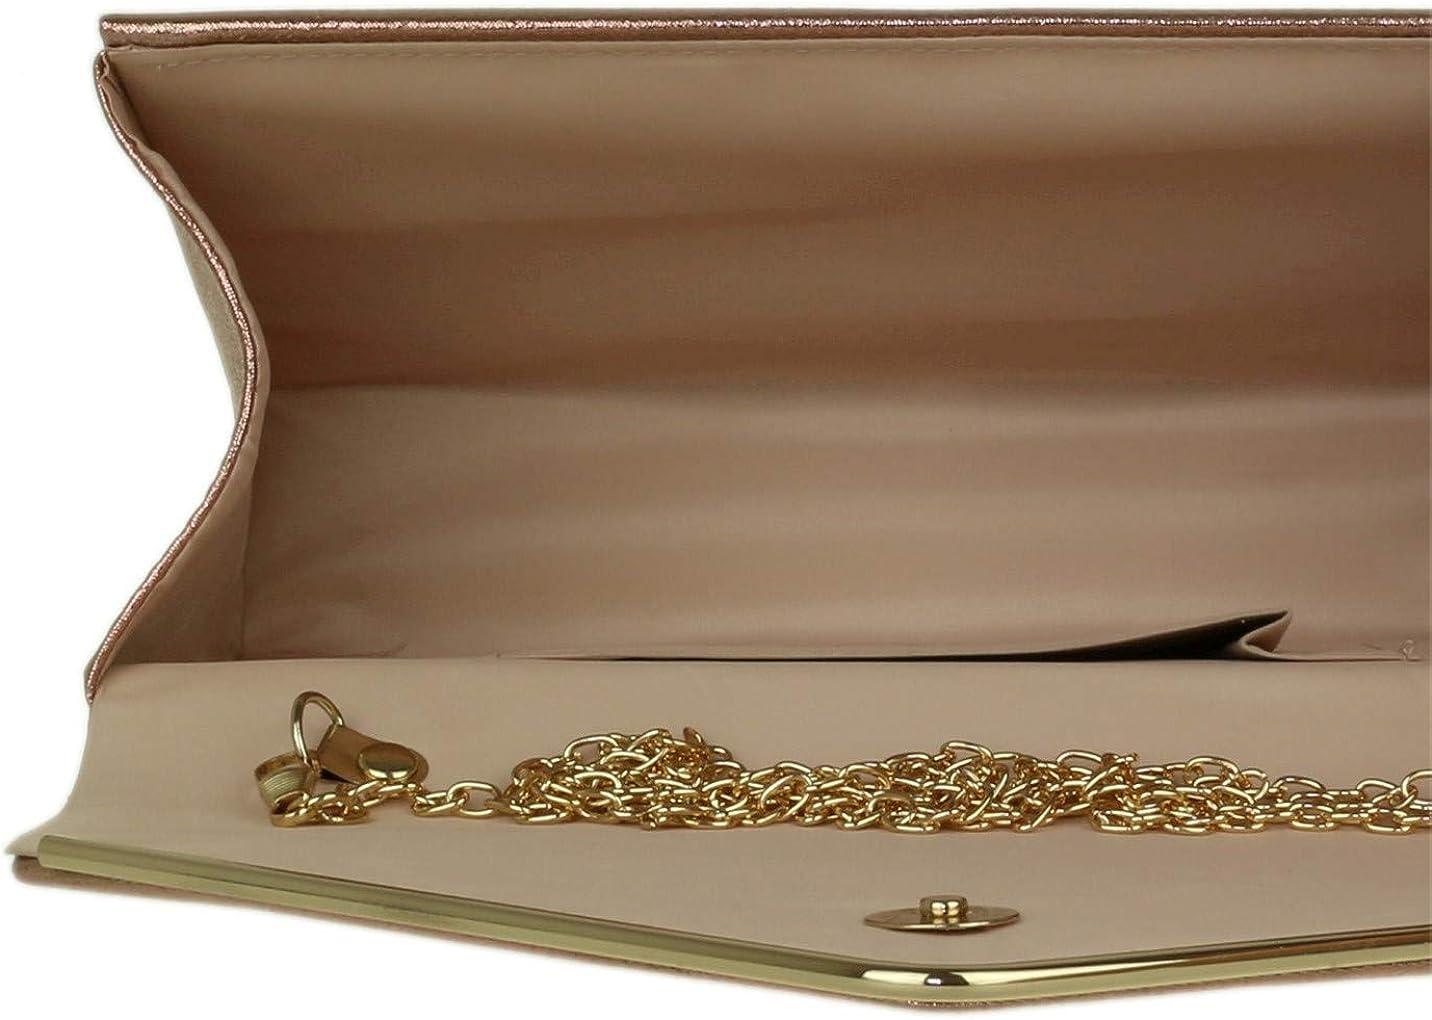 Girly Handbags Faux Suede Clutch Bag Envelope Metallic Frame Women Handbag